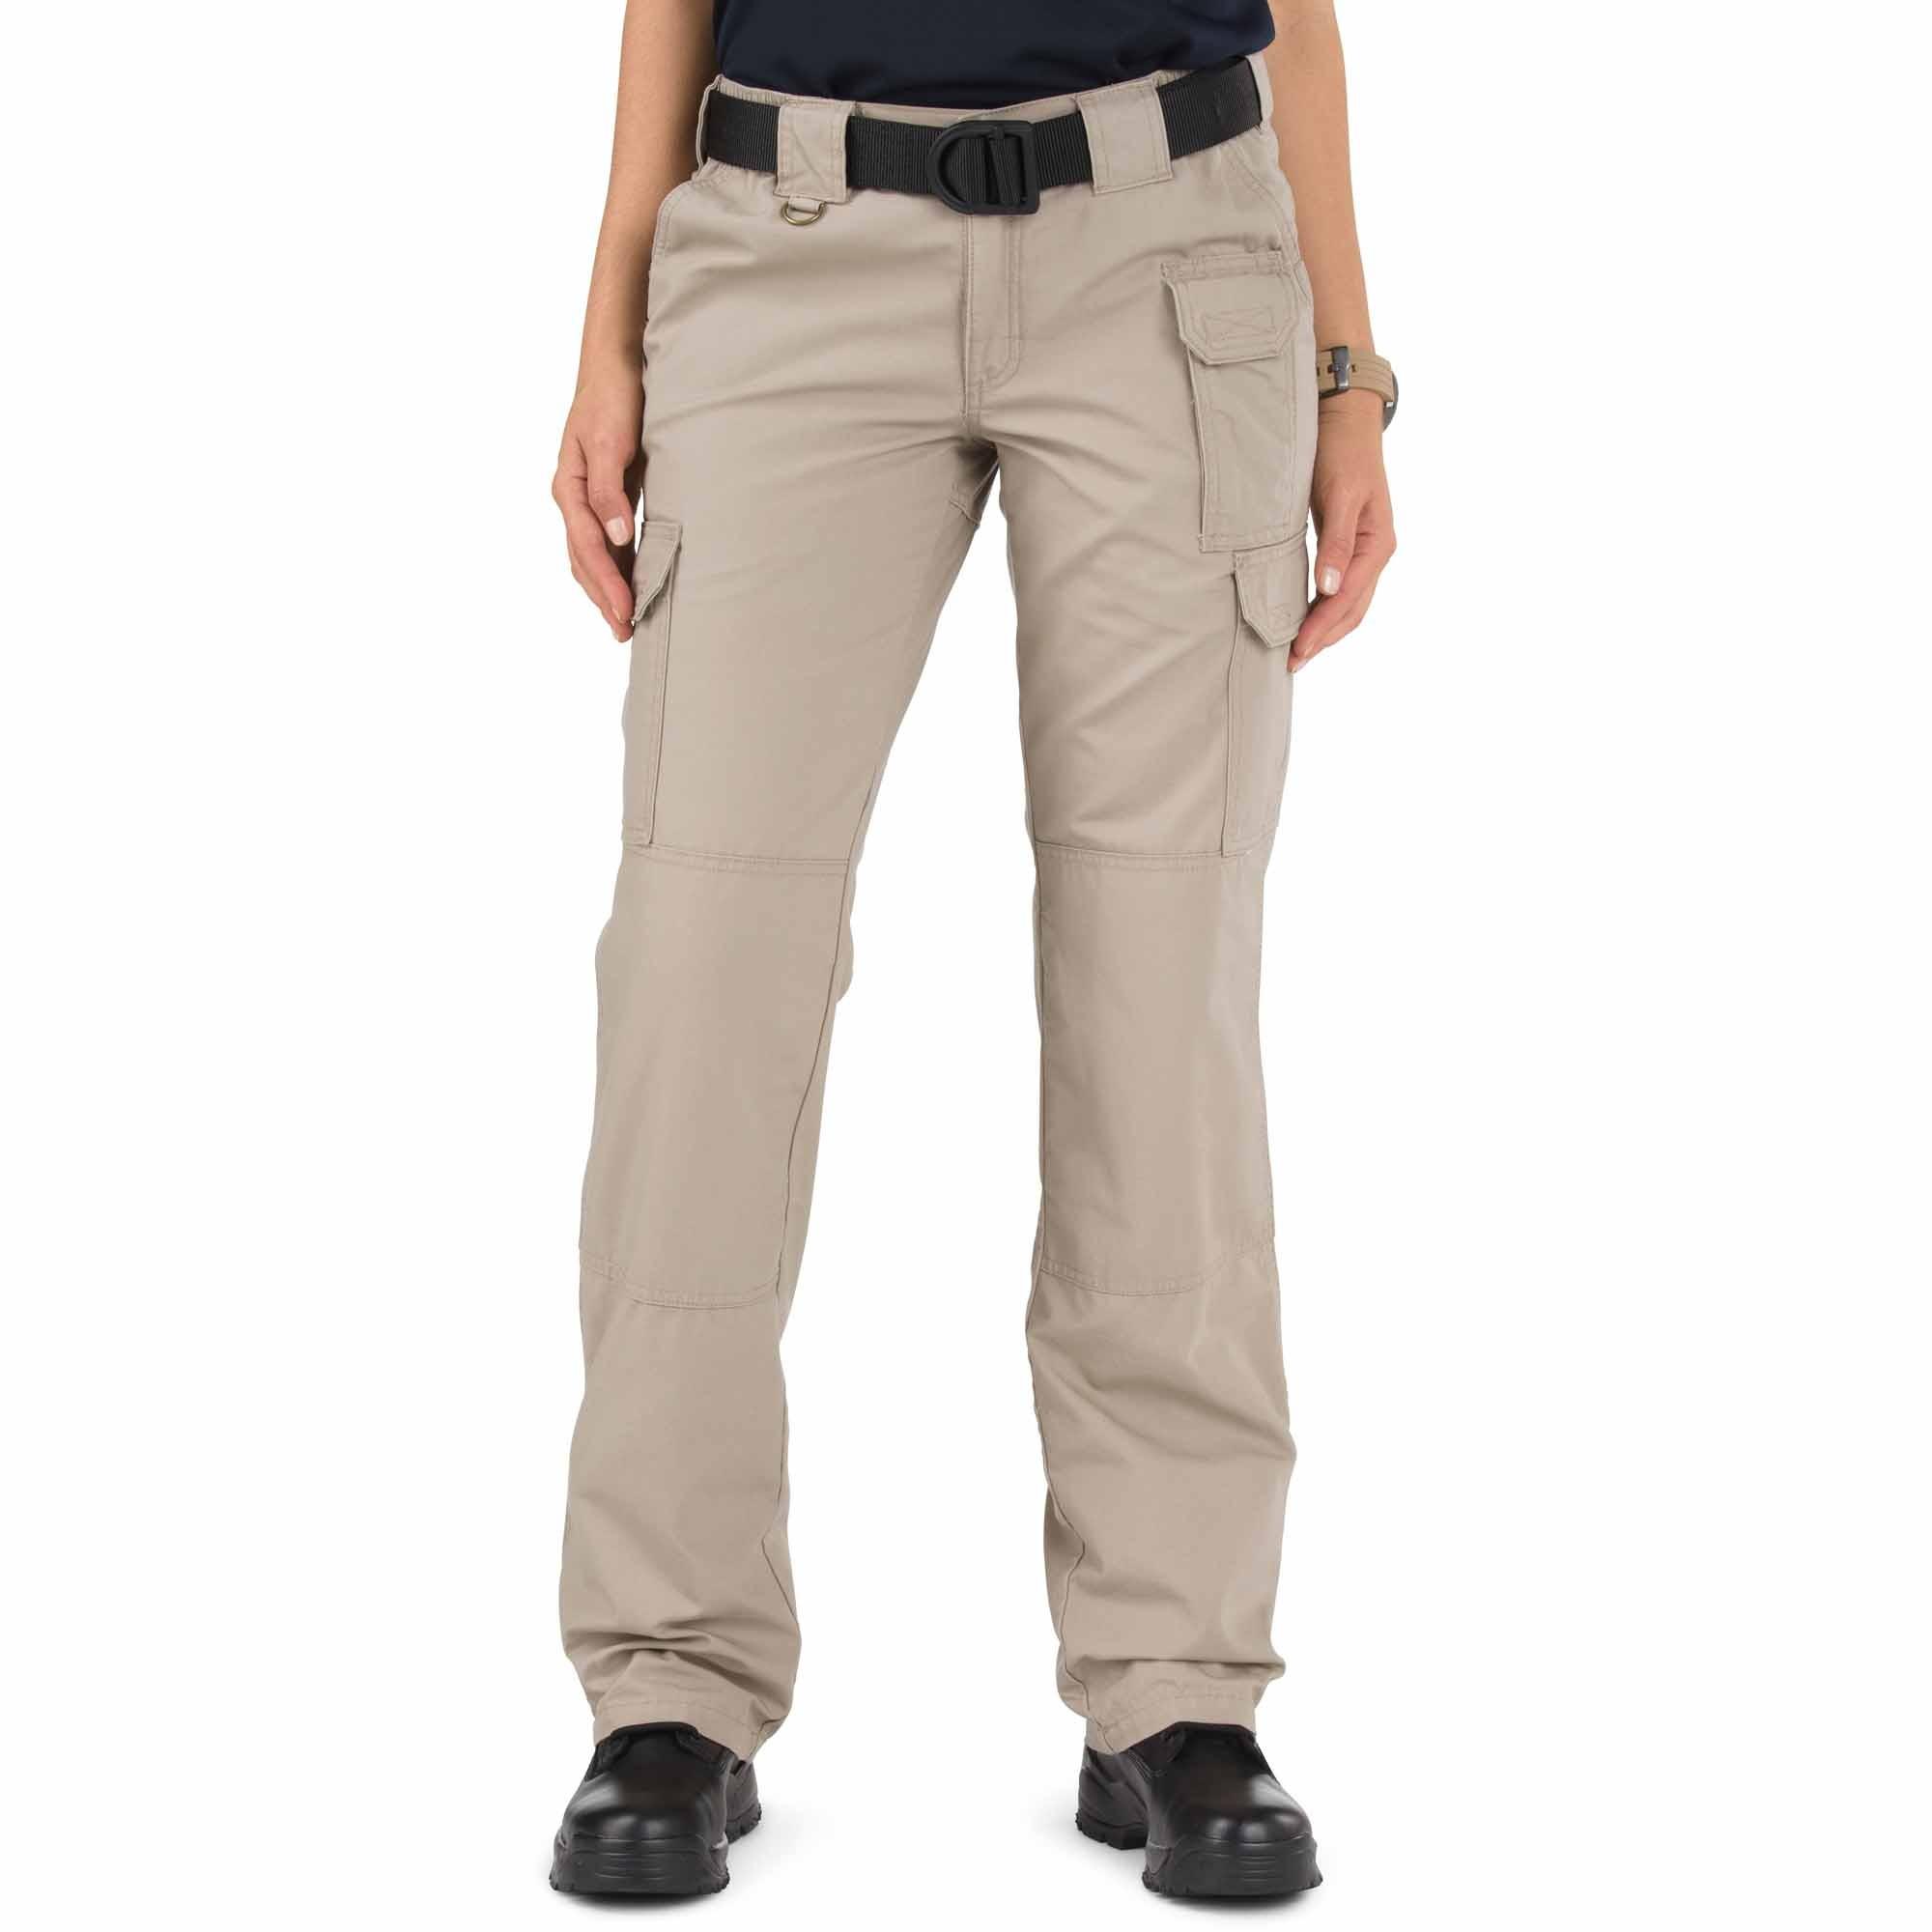 5.11 Tactical Pants -Women's